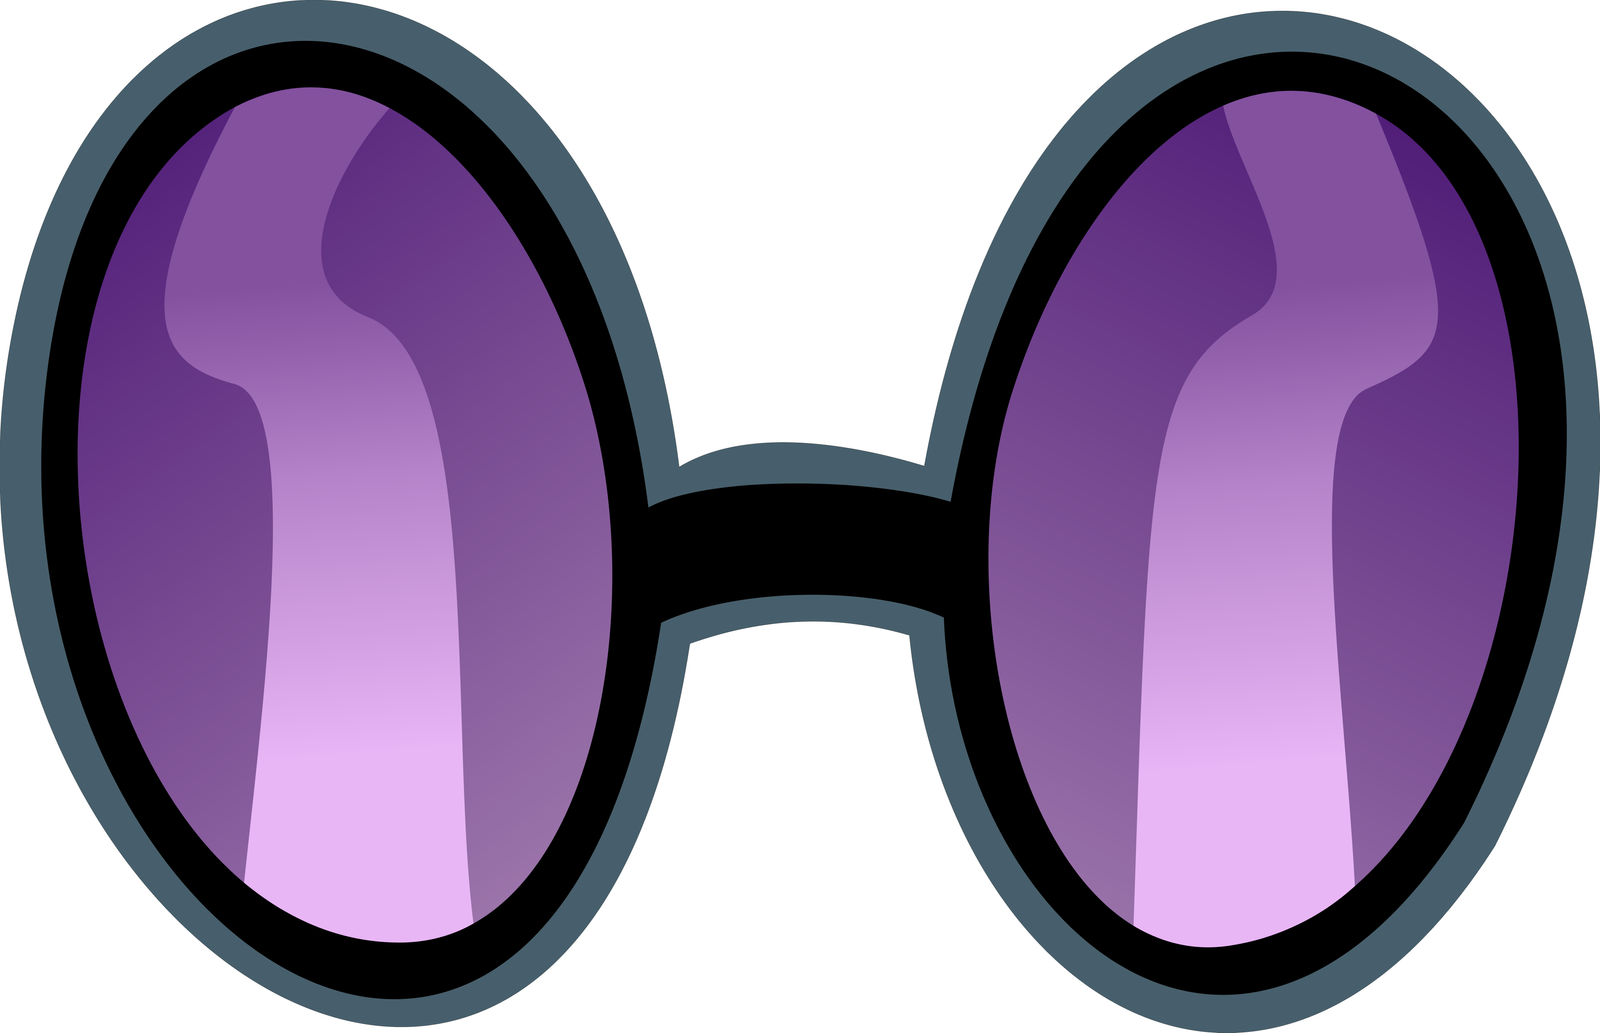 Vinyl Scratch Glasses By Phoenix0117 On Deviantart